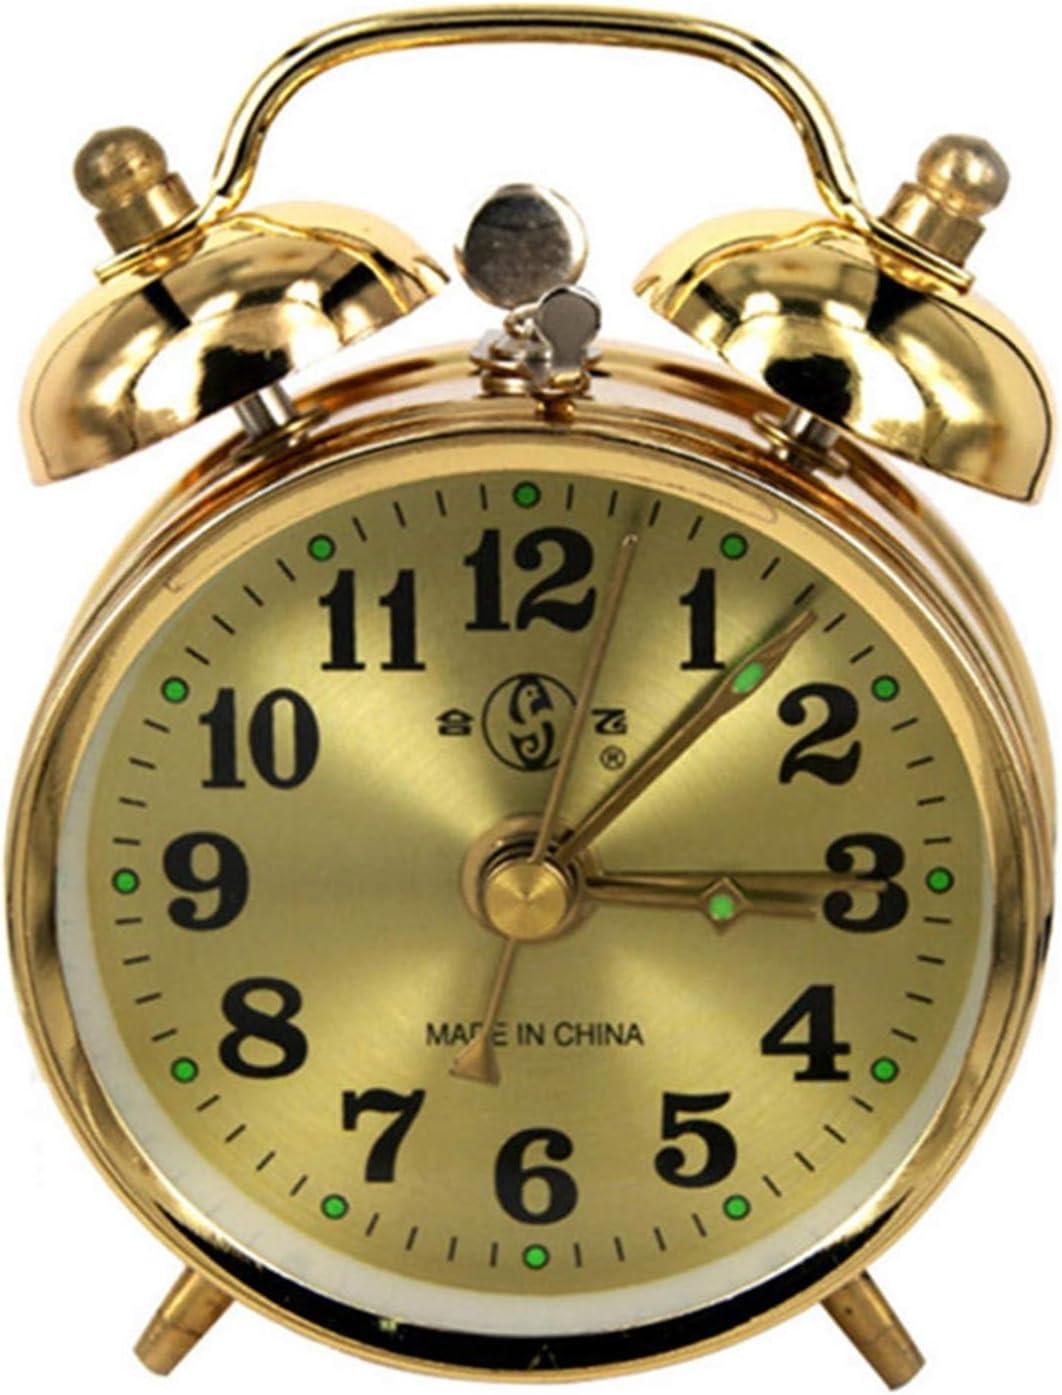 YINGBBH supreme Alarm Clock 7cm Mechanical Manual Up Vi Wind Surprise price